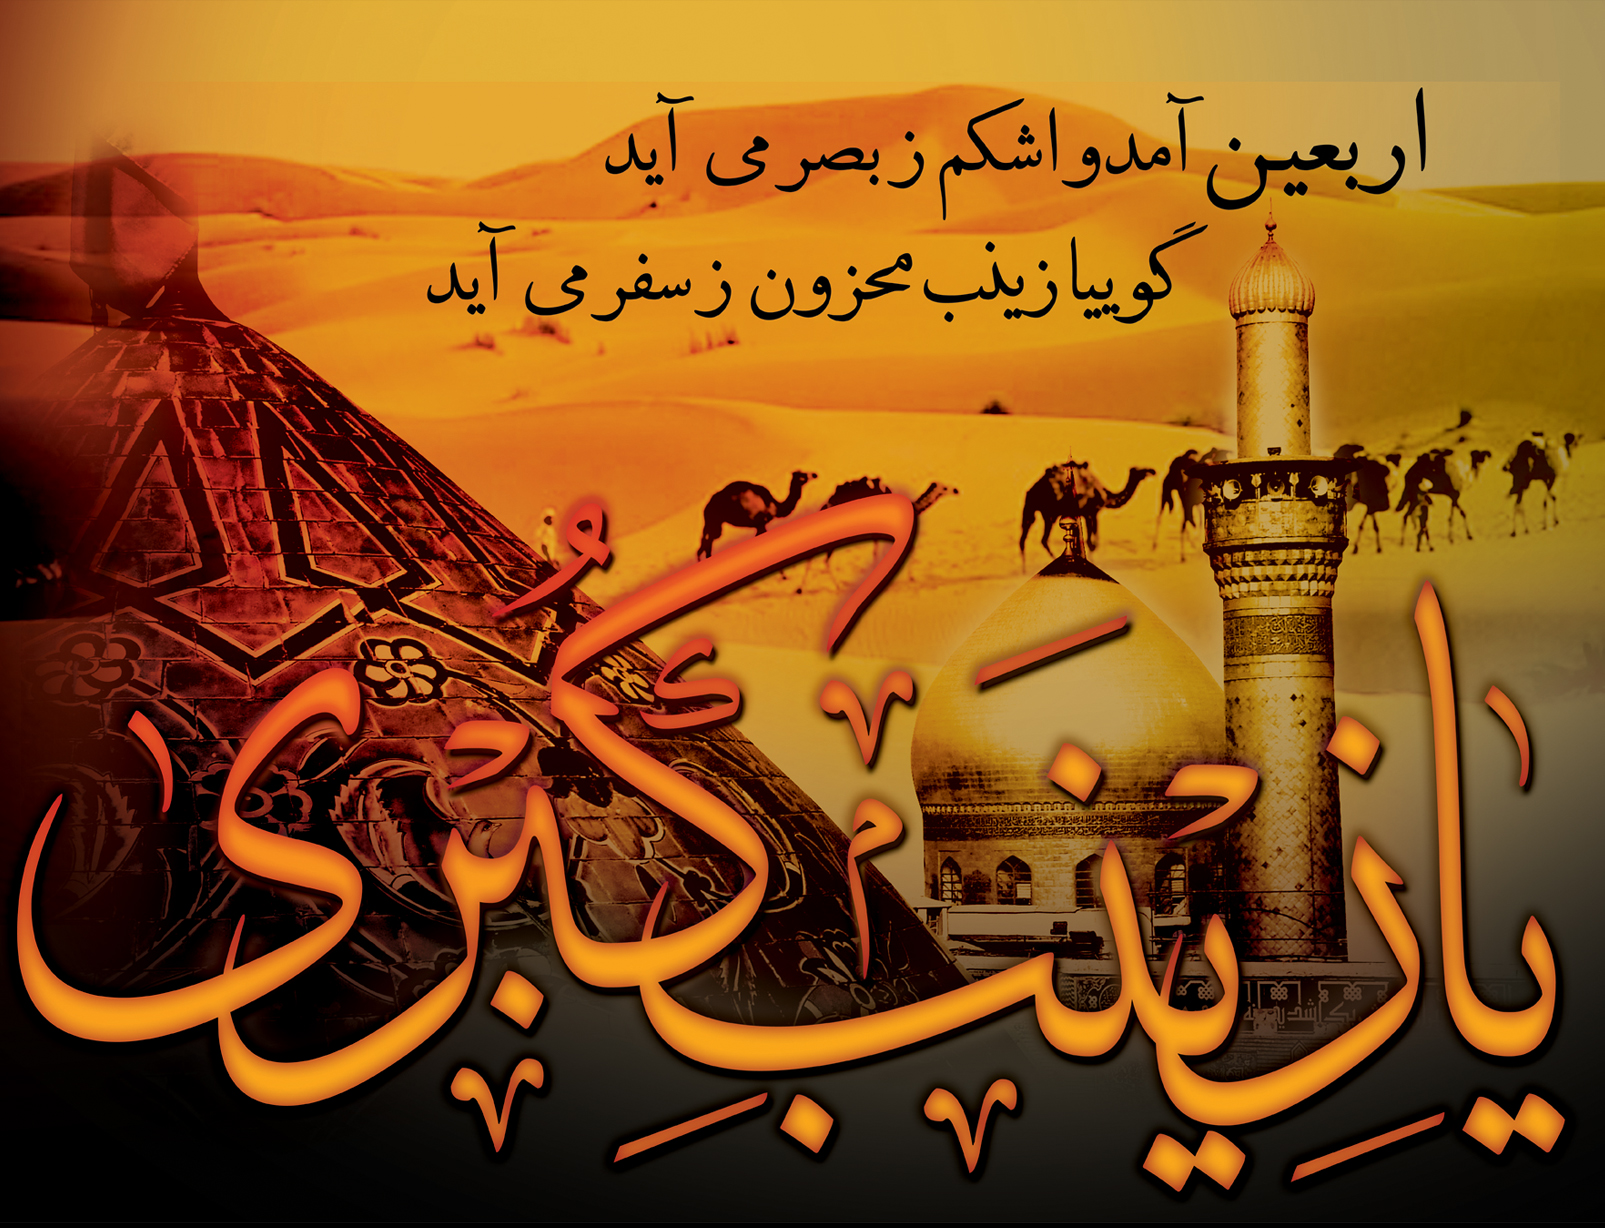 Image result for اربعین حسینی تسلیت باد